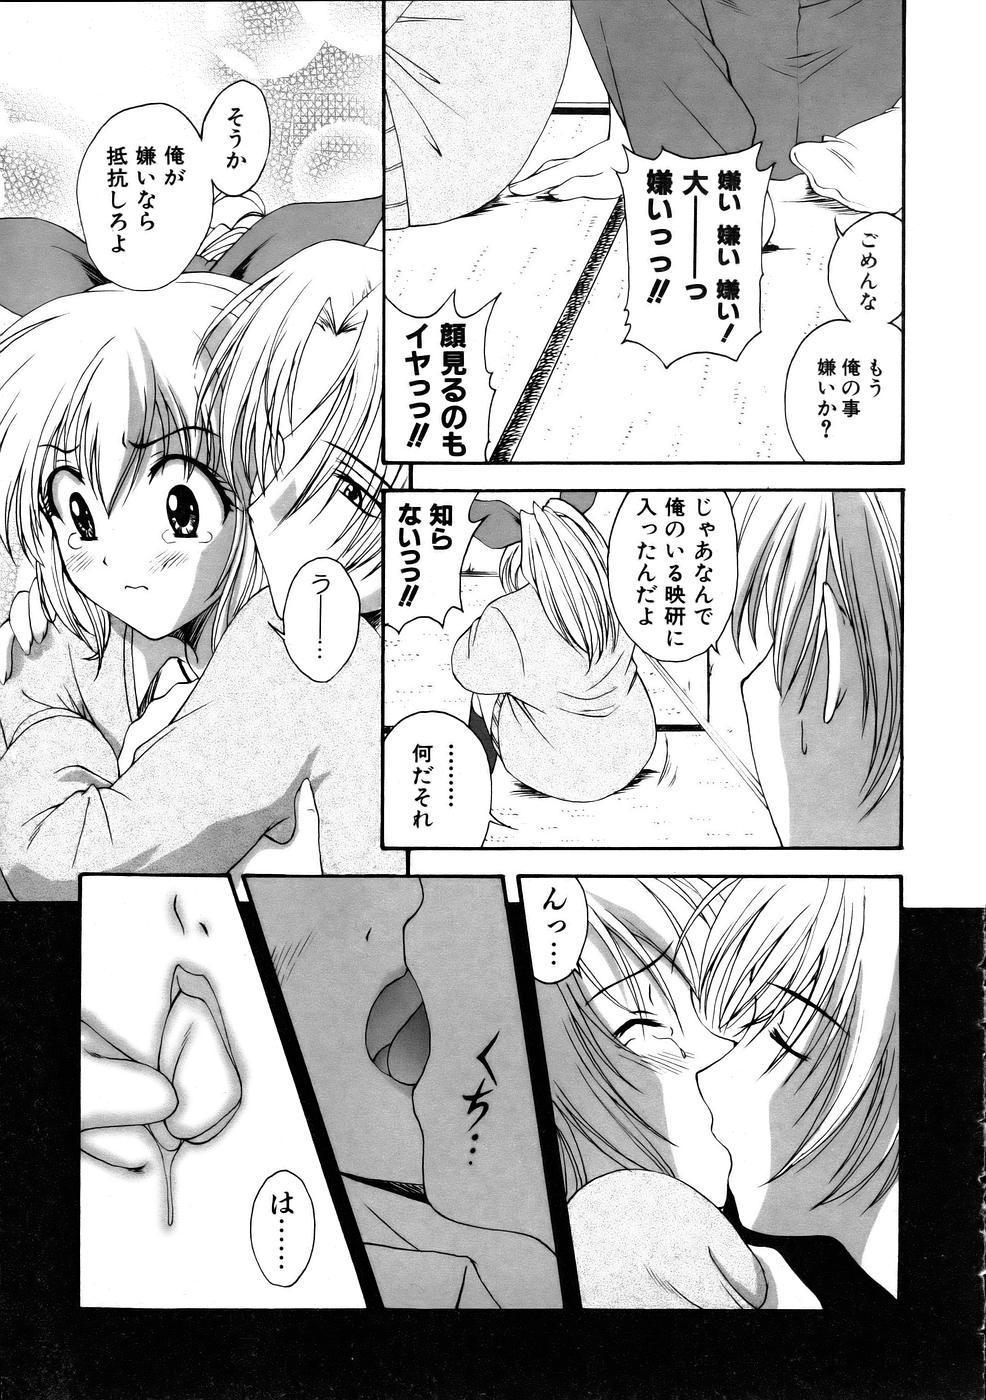 COMIC AUN 2005-10 Vol. 113 262